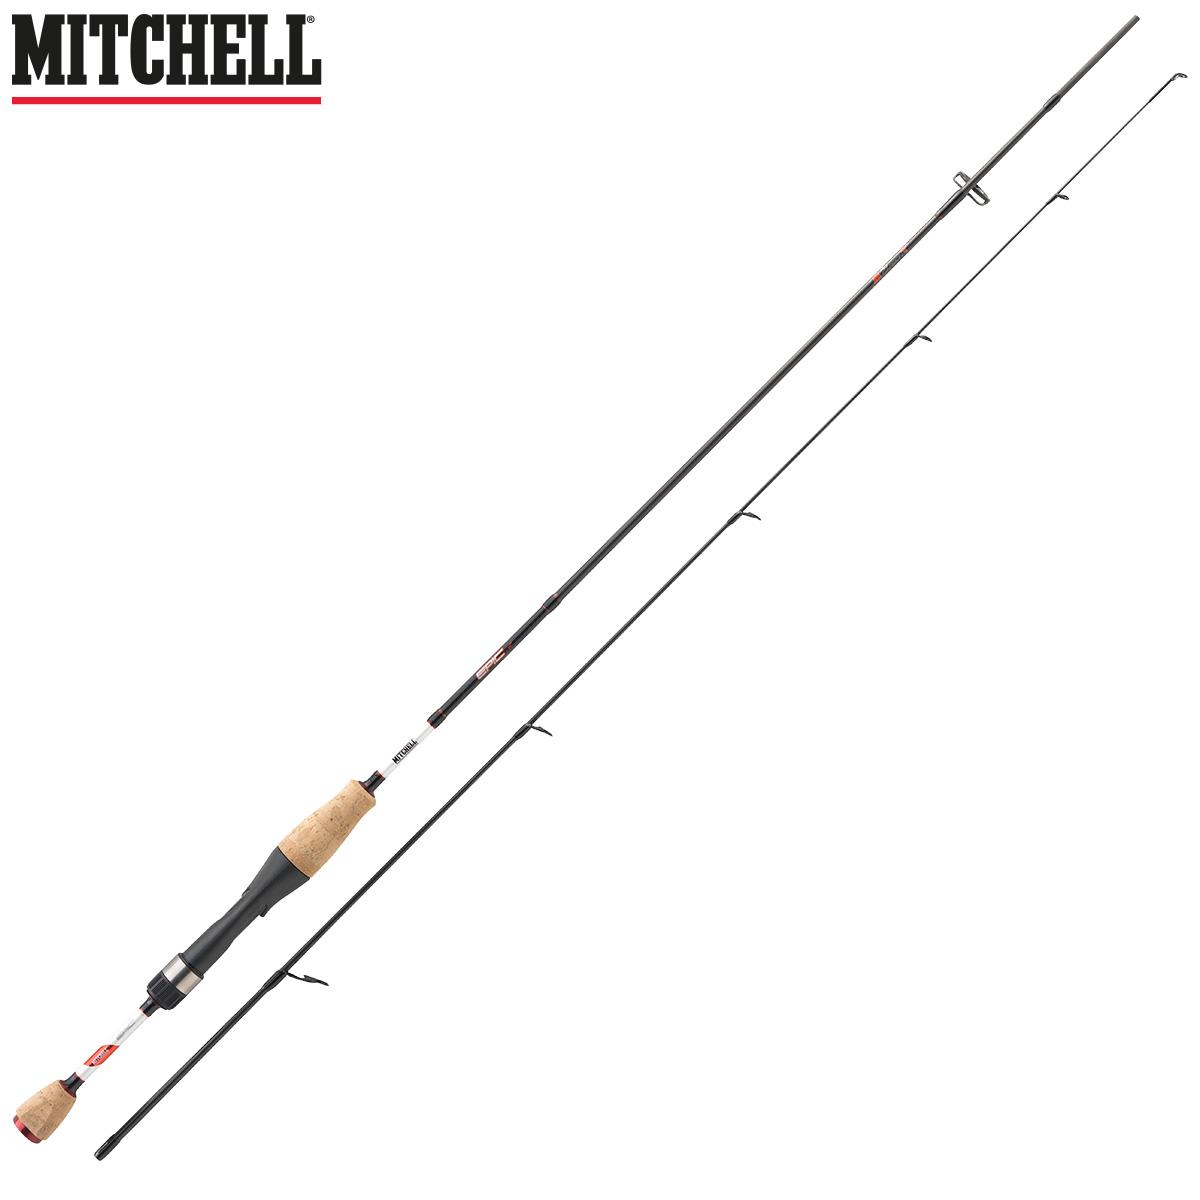 MITCHELL Epic RZ Spinning | 6 Modelle